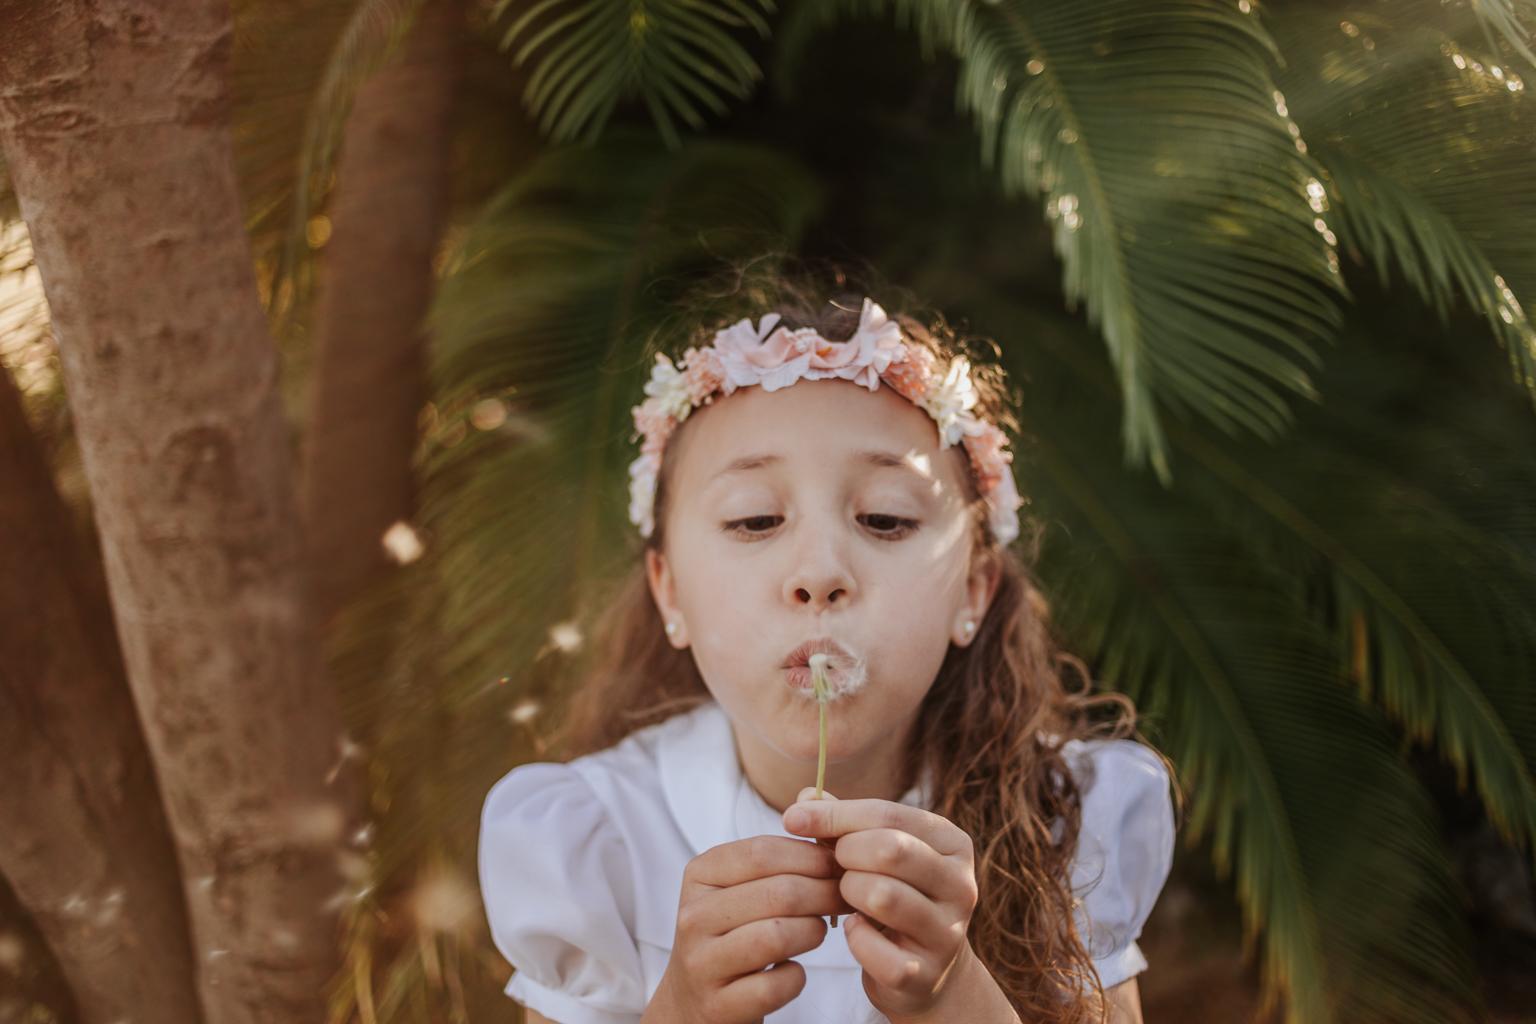 fotógrafo primera comunión :: fotografía pimera comunión :: primera comunión :: fotógrafo infantil :: sesión de primera comunión